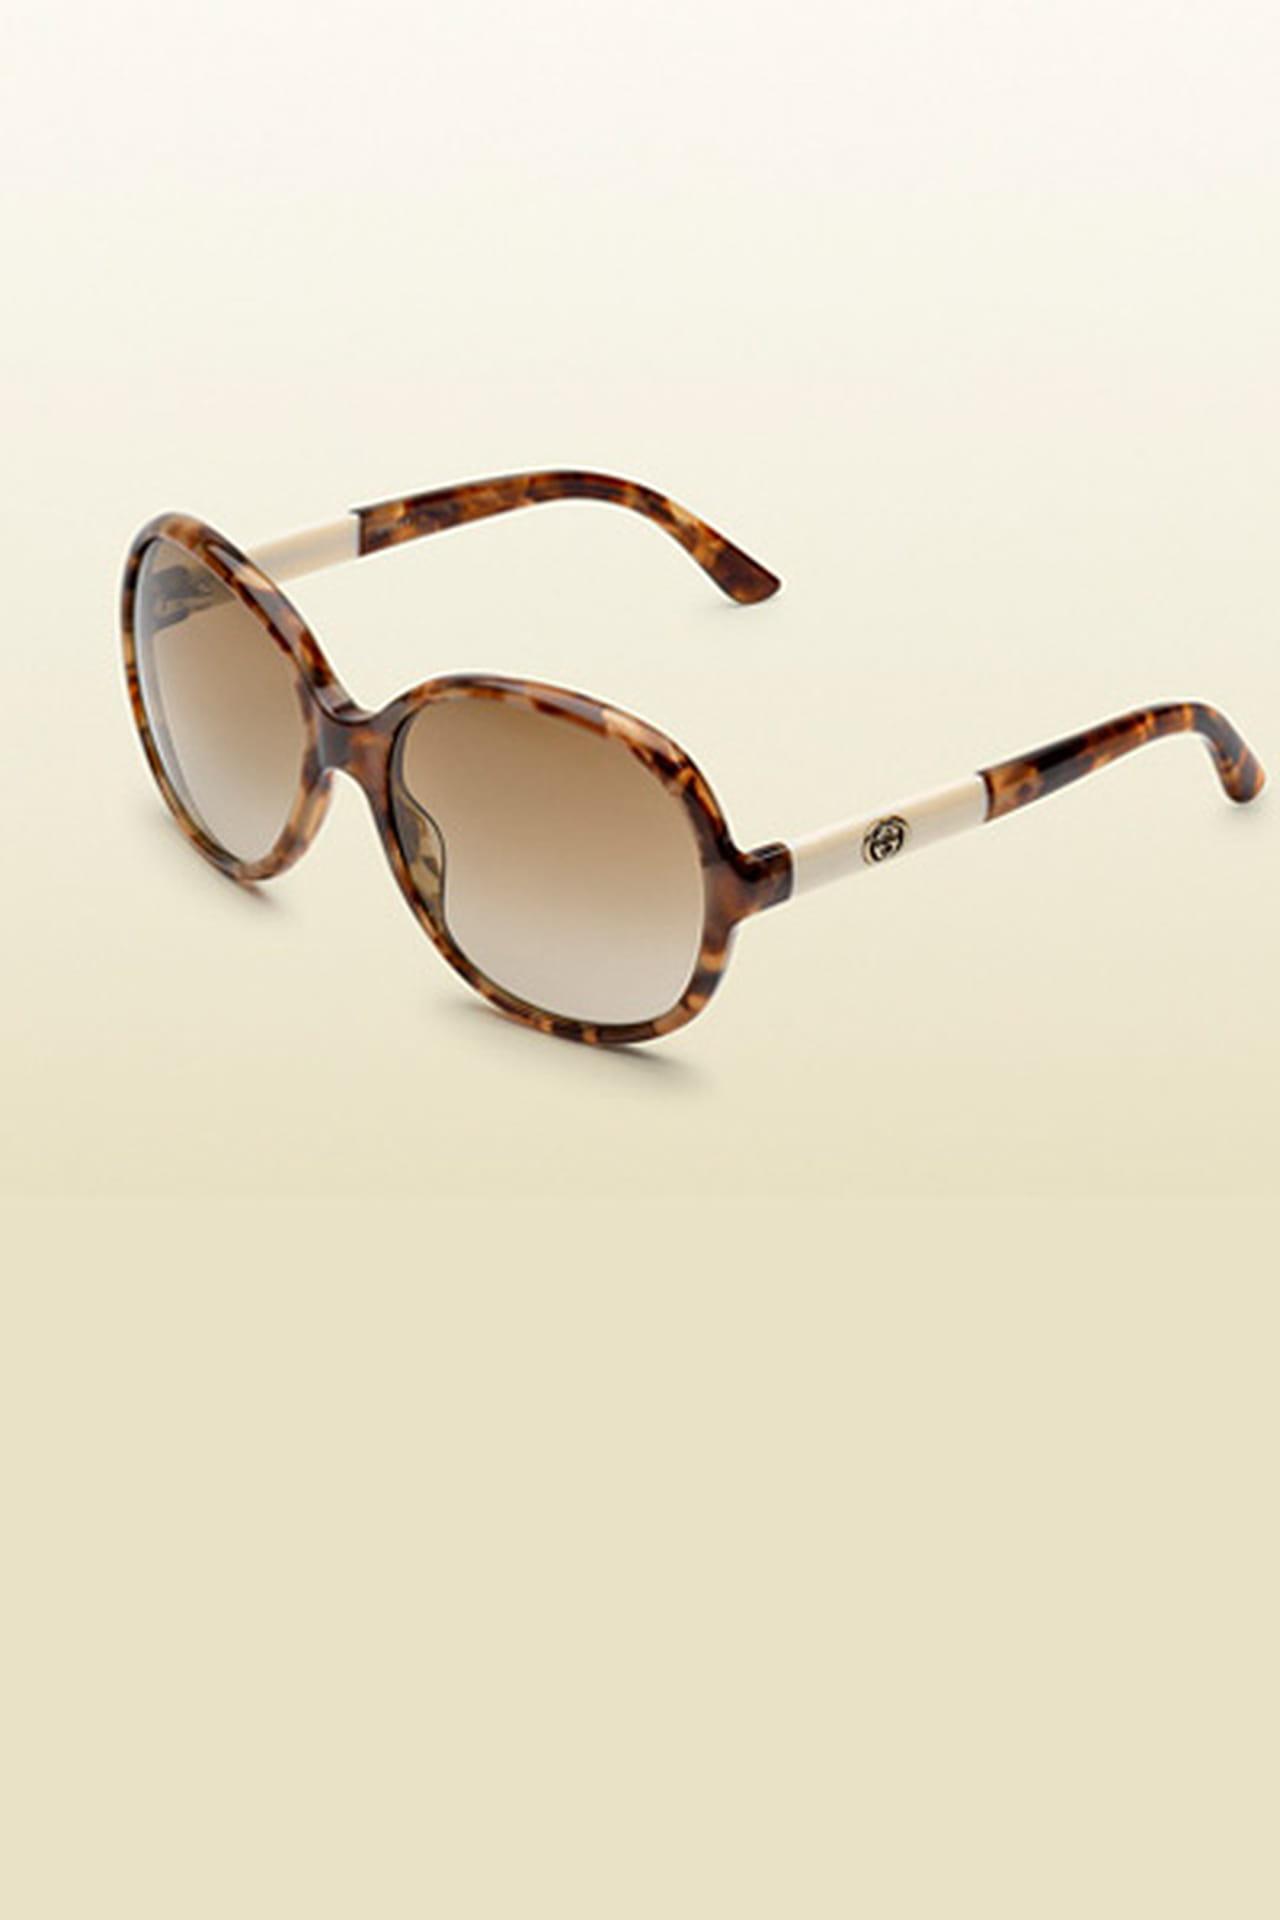 89775e6a7 نظارة شمسية من اللون البني مع شكل دائري من Gucci. من مجموعة Gucci لربيع وصيف  2013